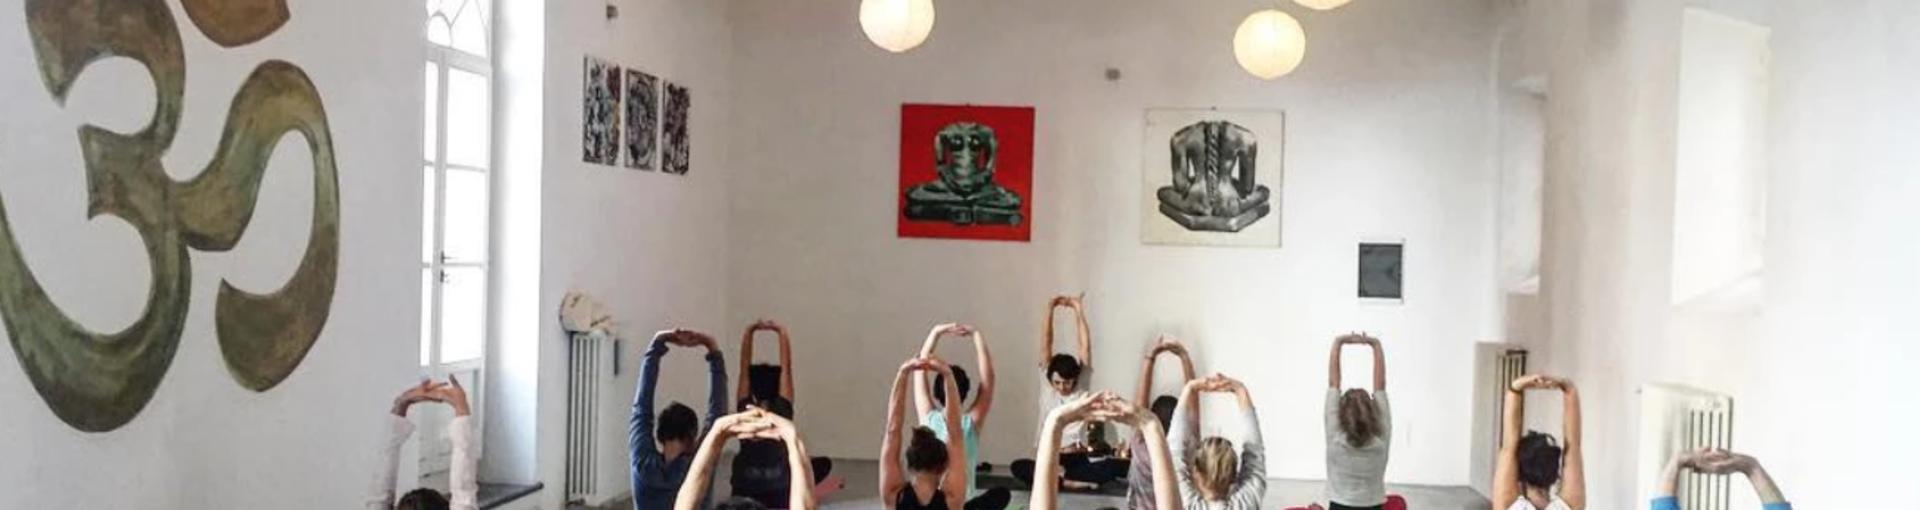 Italia Power Yoga - Santo Spirito - Firenze